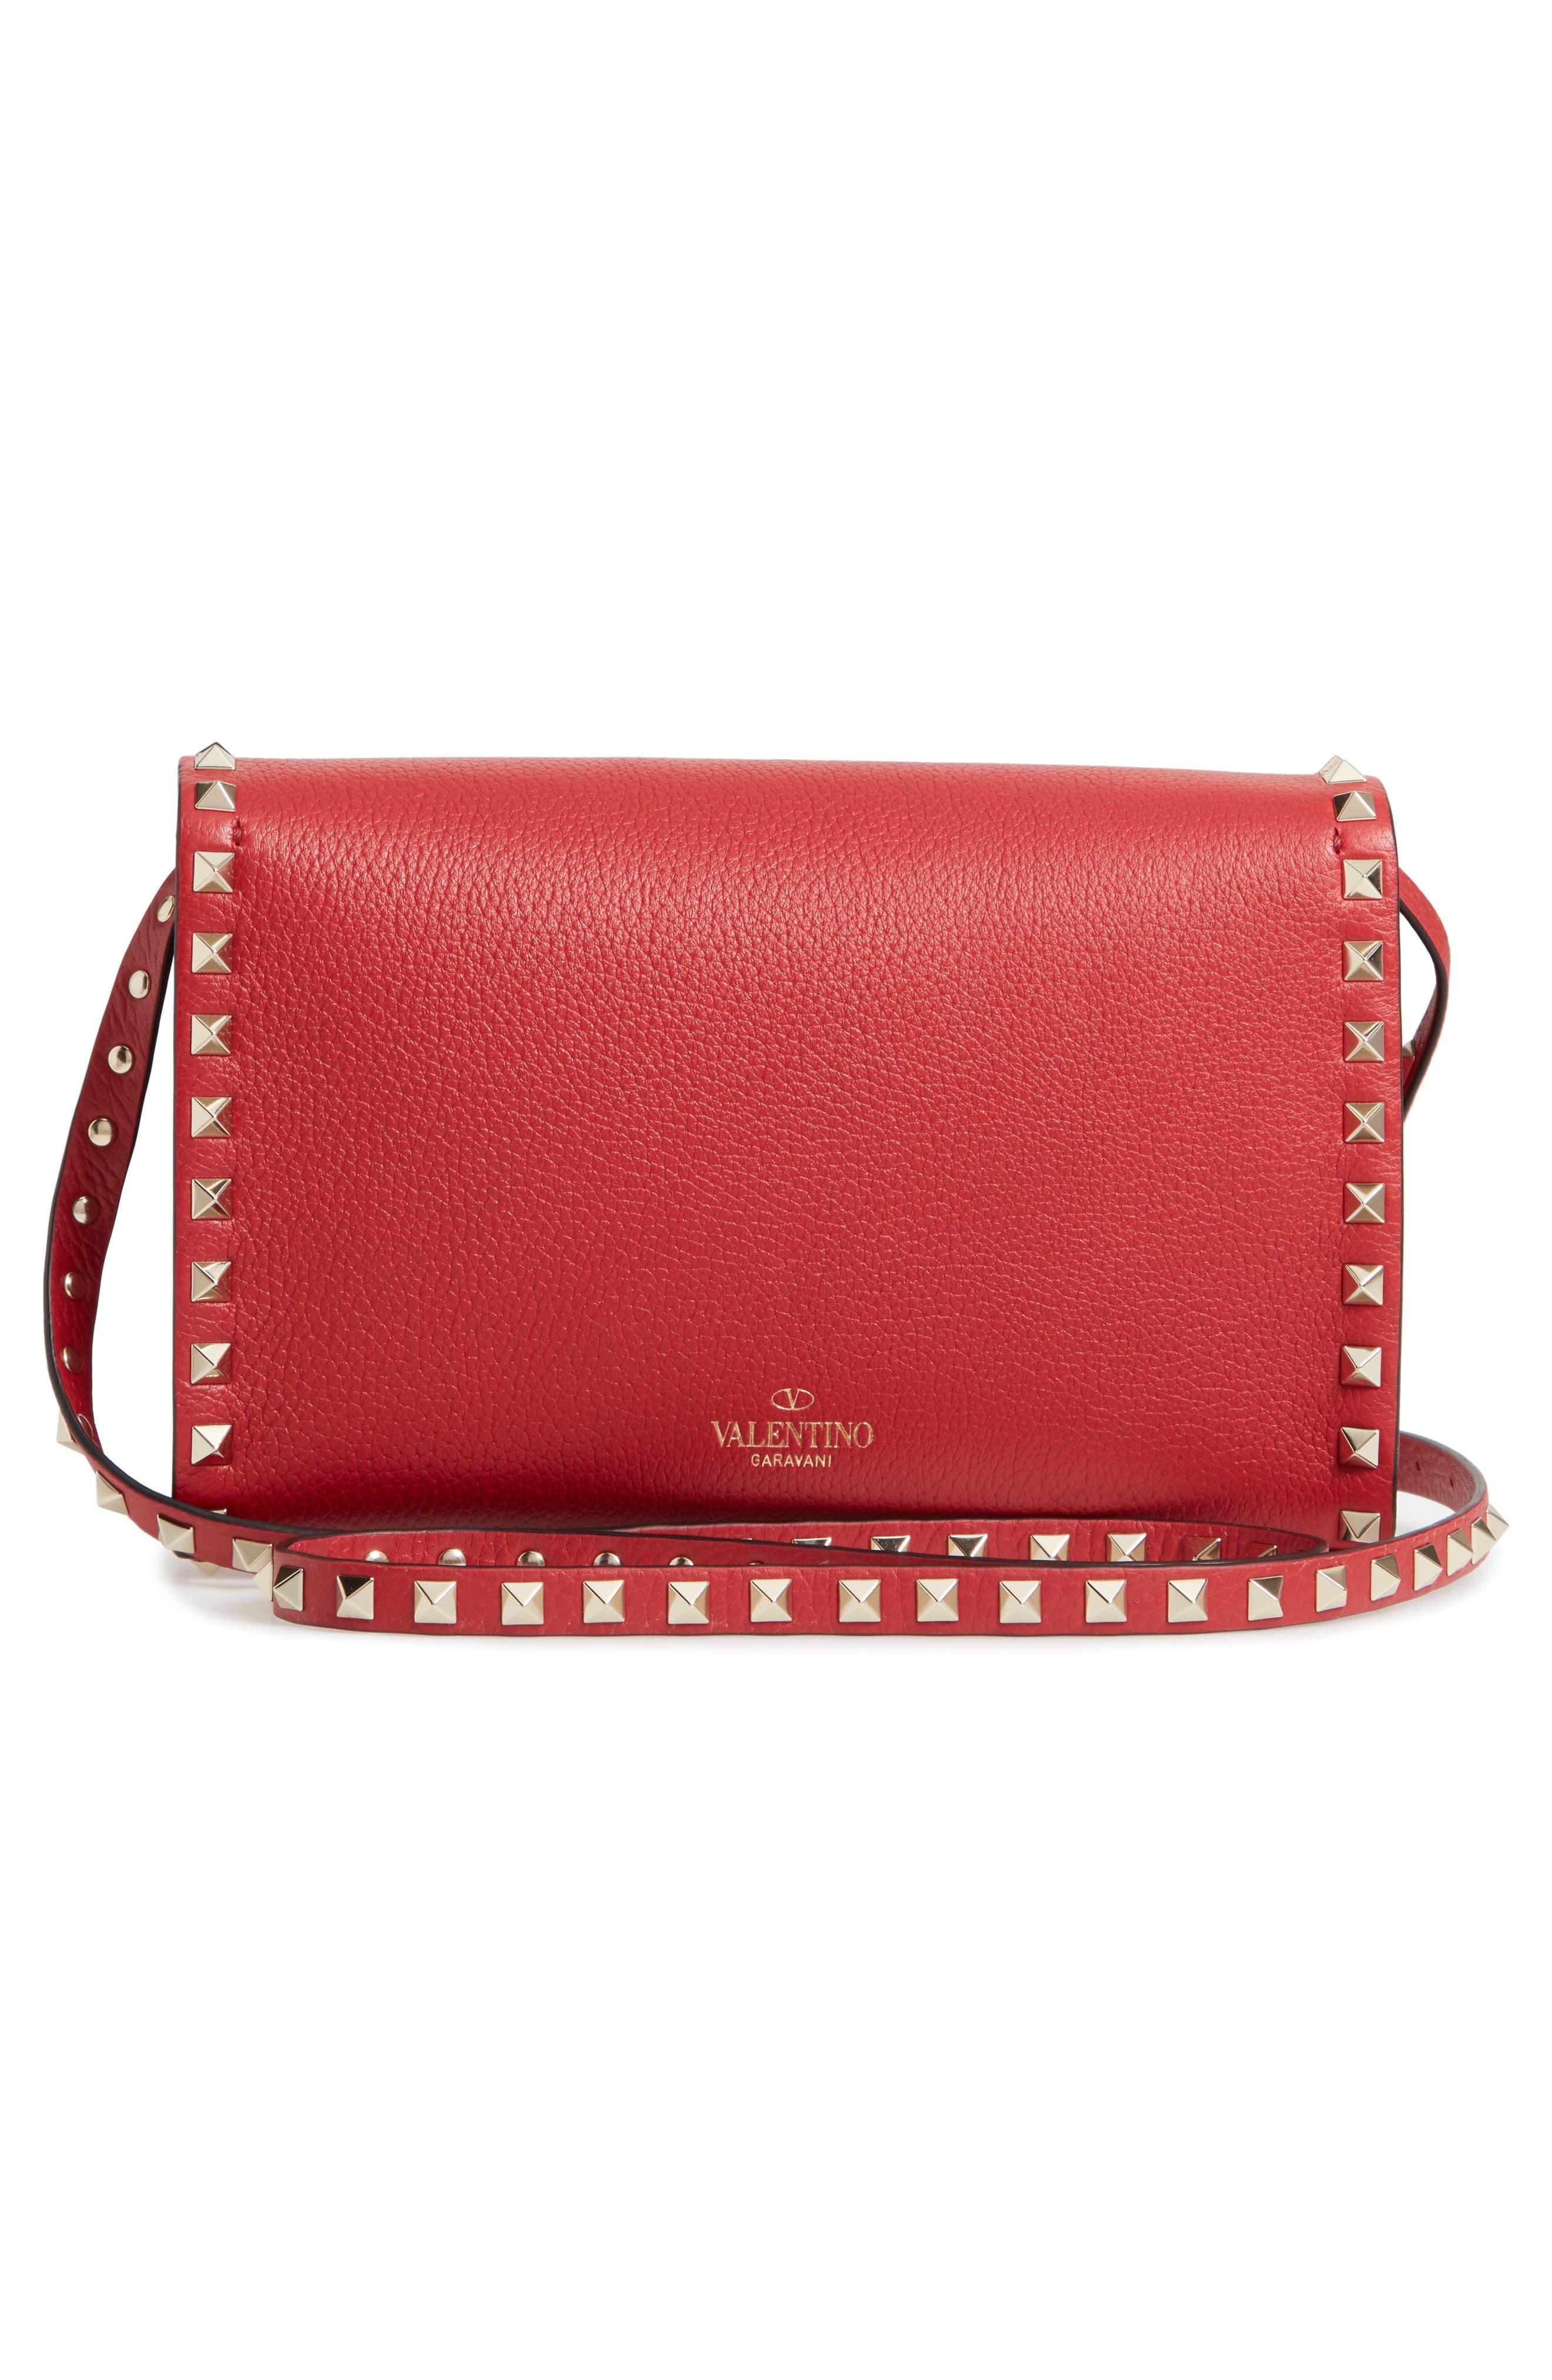 Medium Rockstud Leather Crossbody Bag,                             Alternate thumbnail 3, color,                             ROSSO V